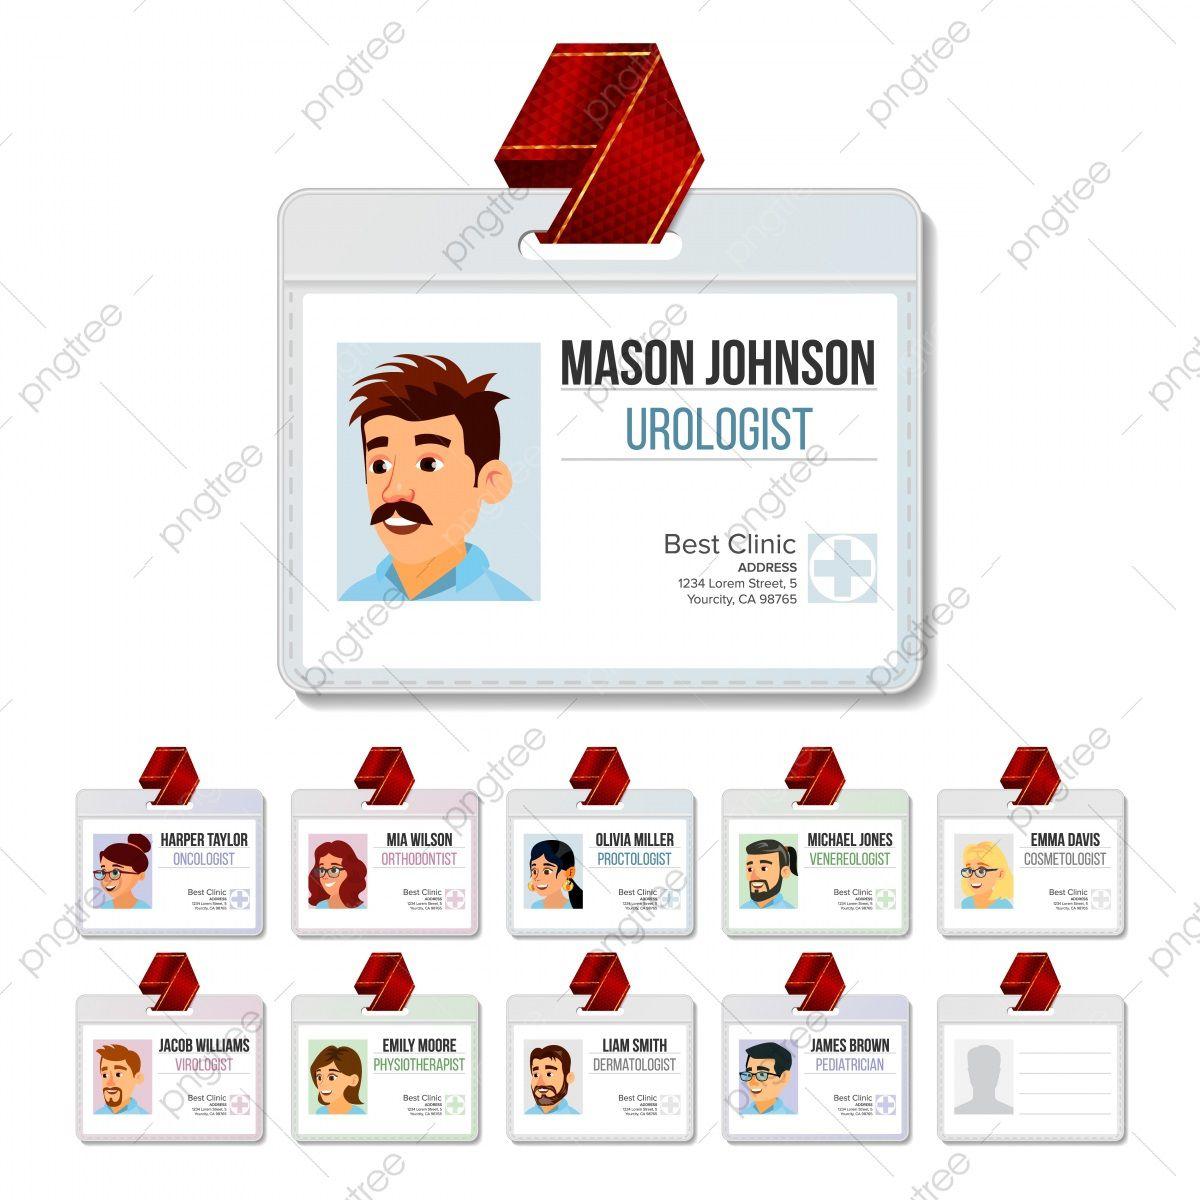 009 Beautiful Id Badge Template Free Image  School Teacher Jurassic ParkFull